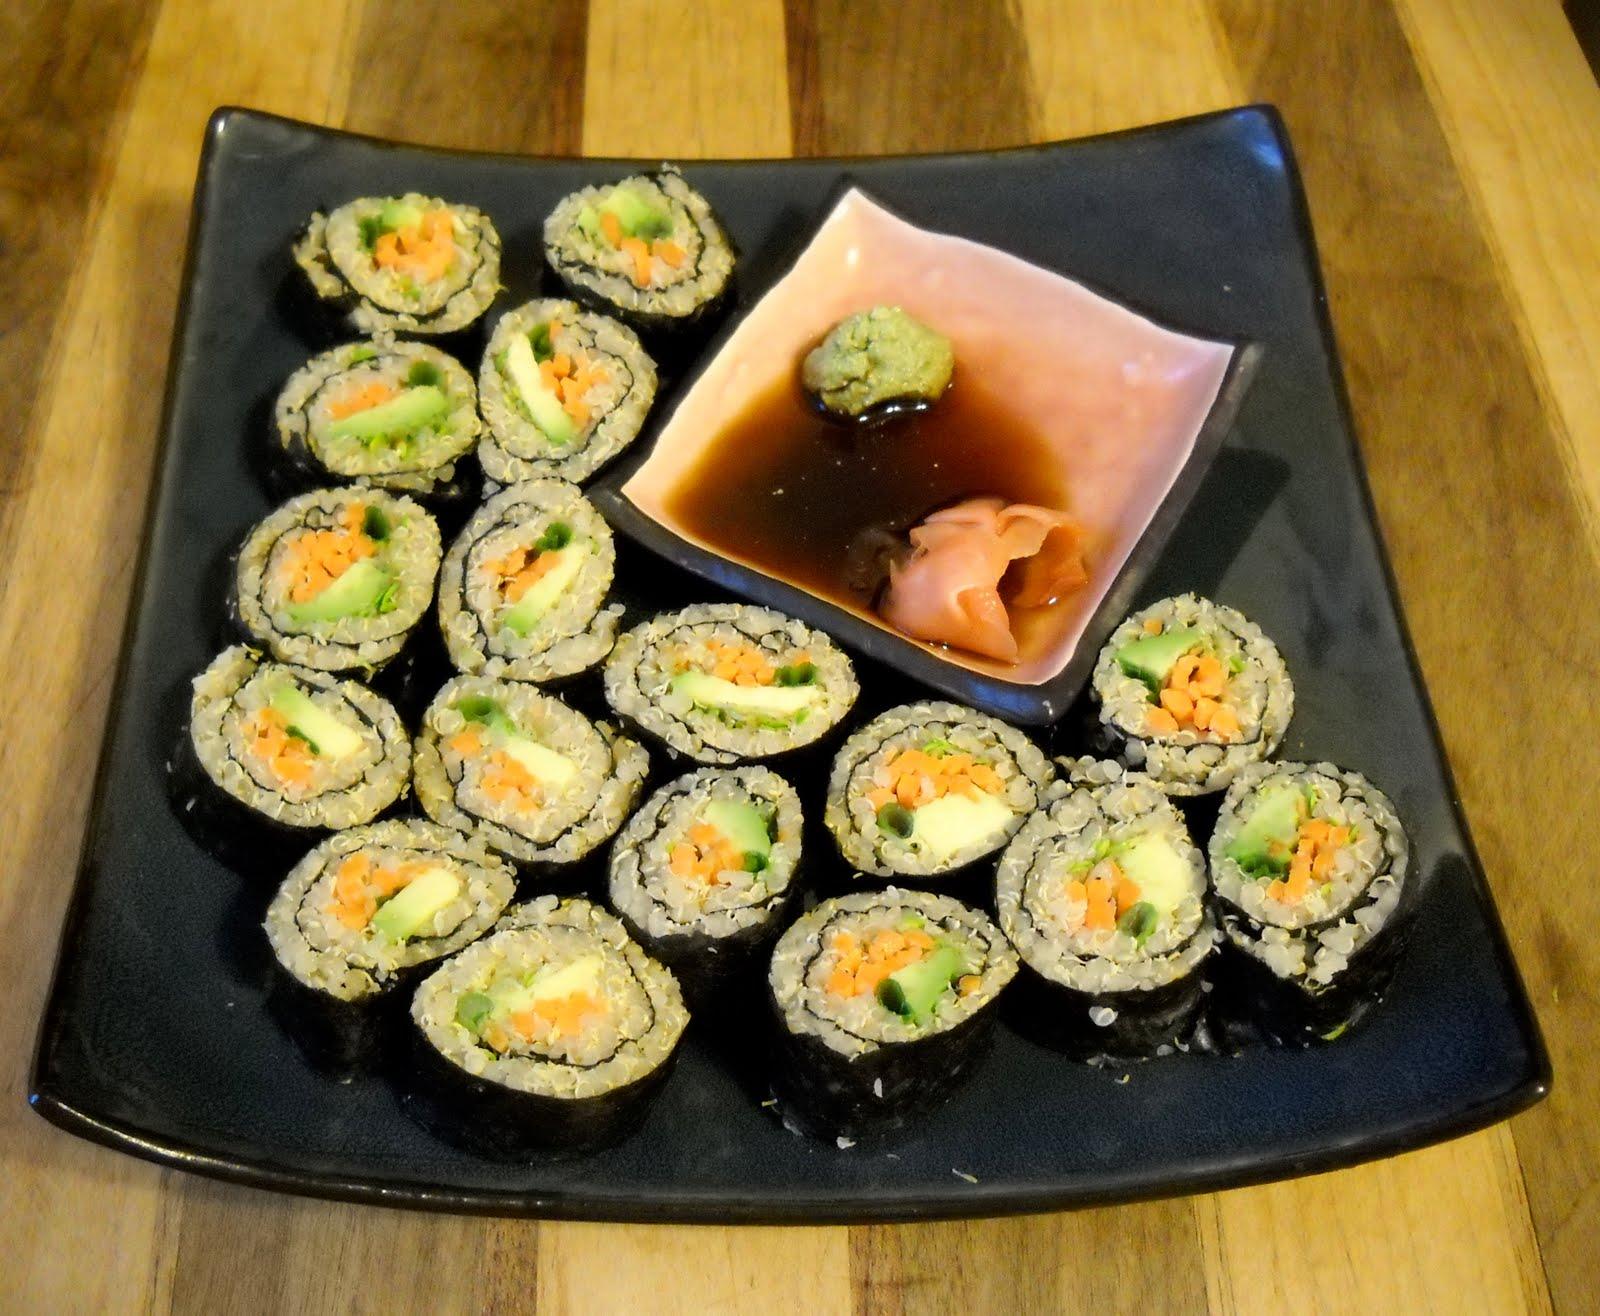 The Life Of A Vegan: Quinoa sushi